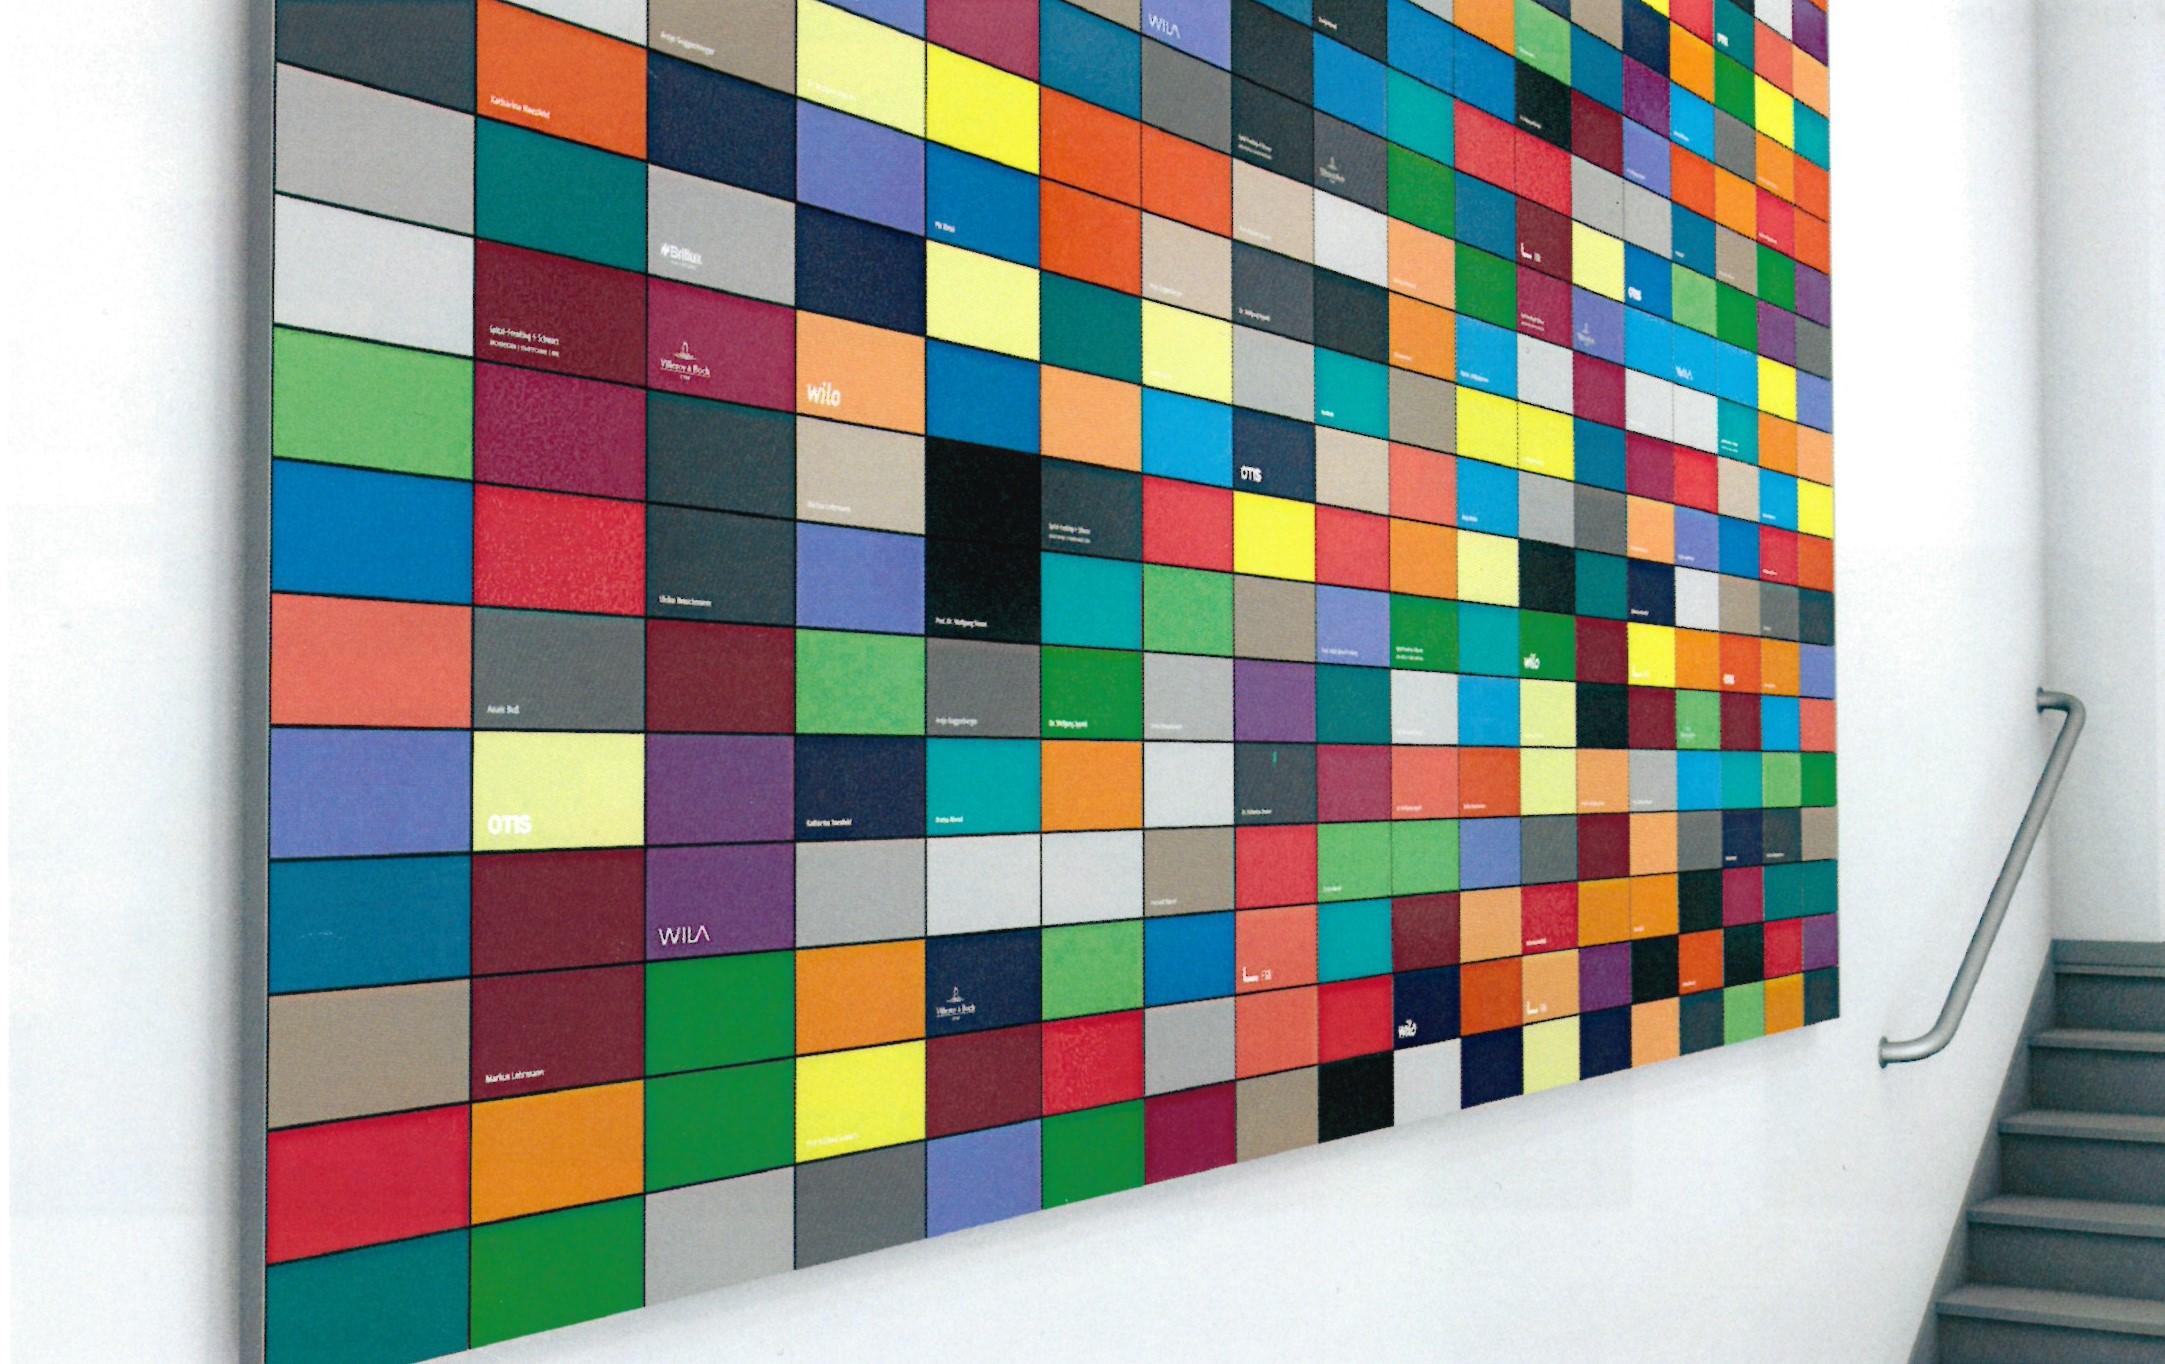 Wand des Dankes Simulation